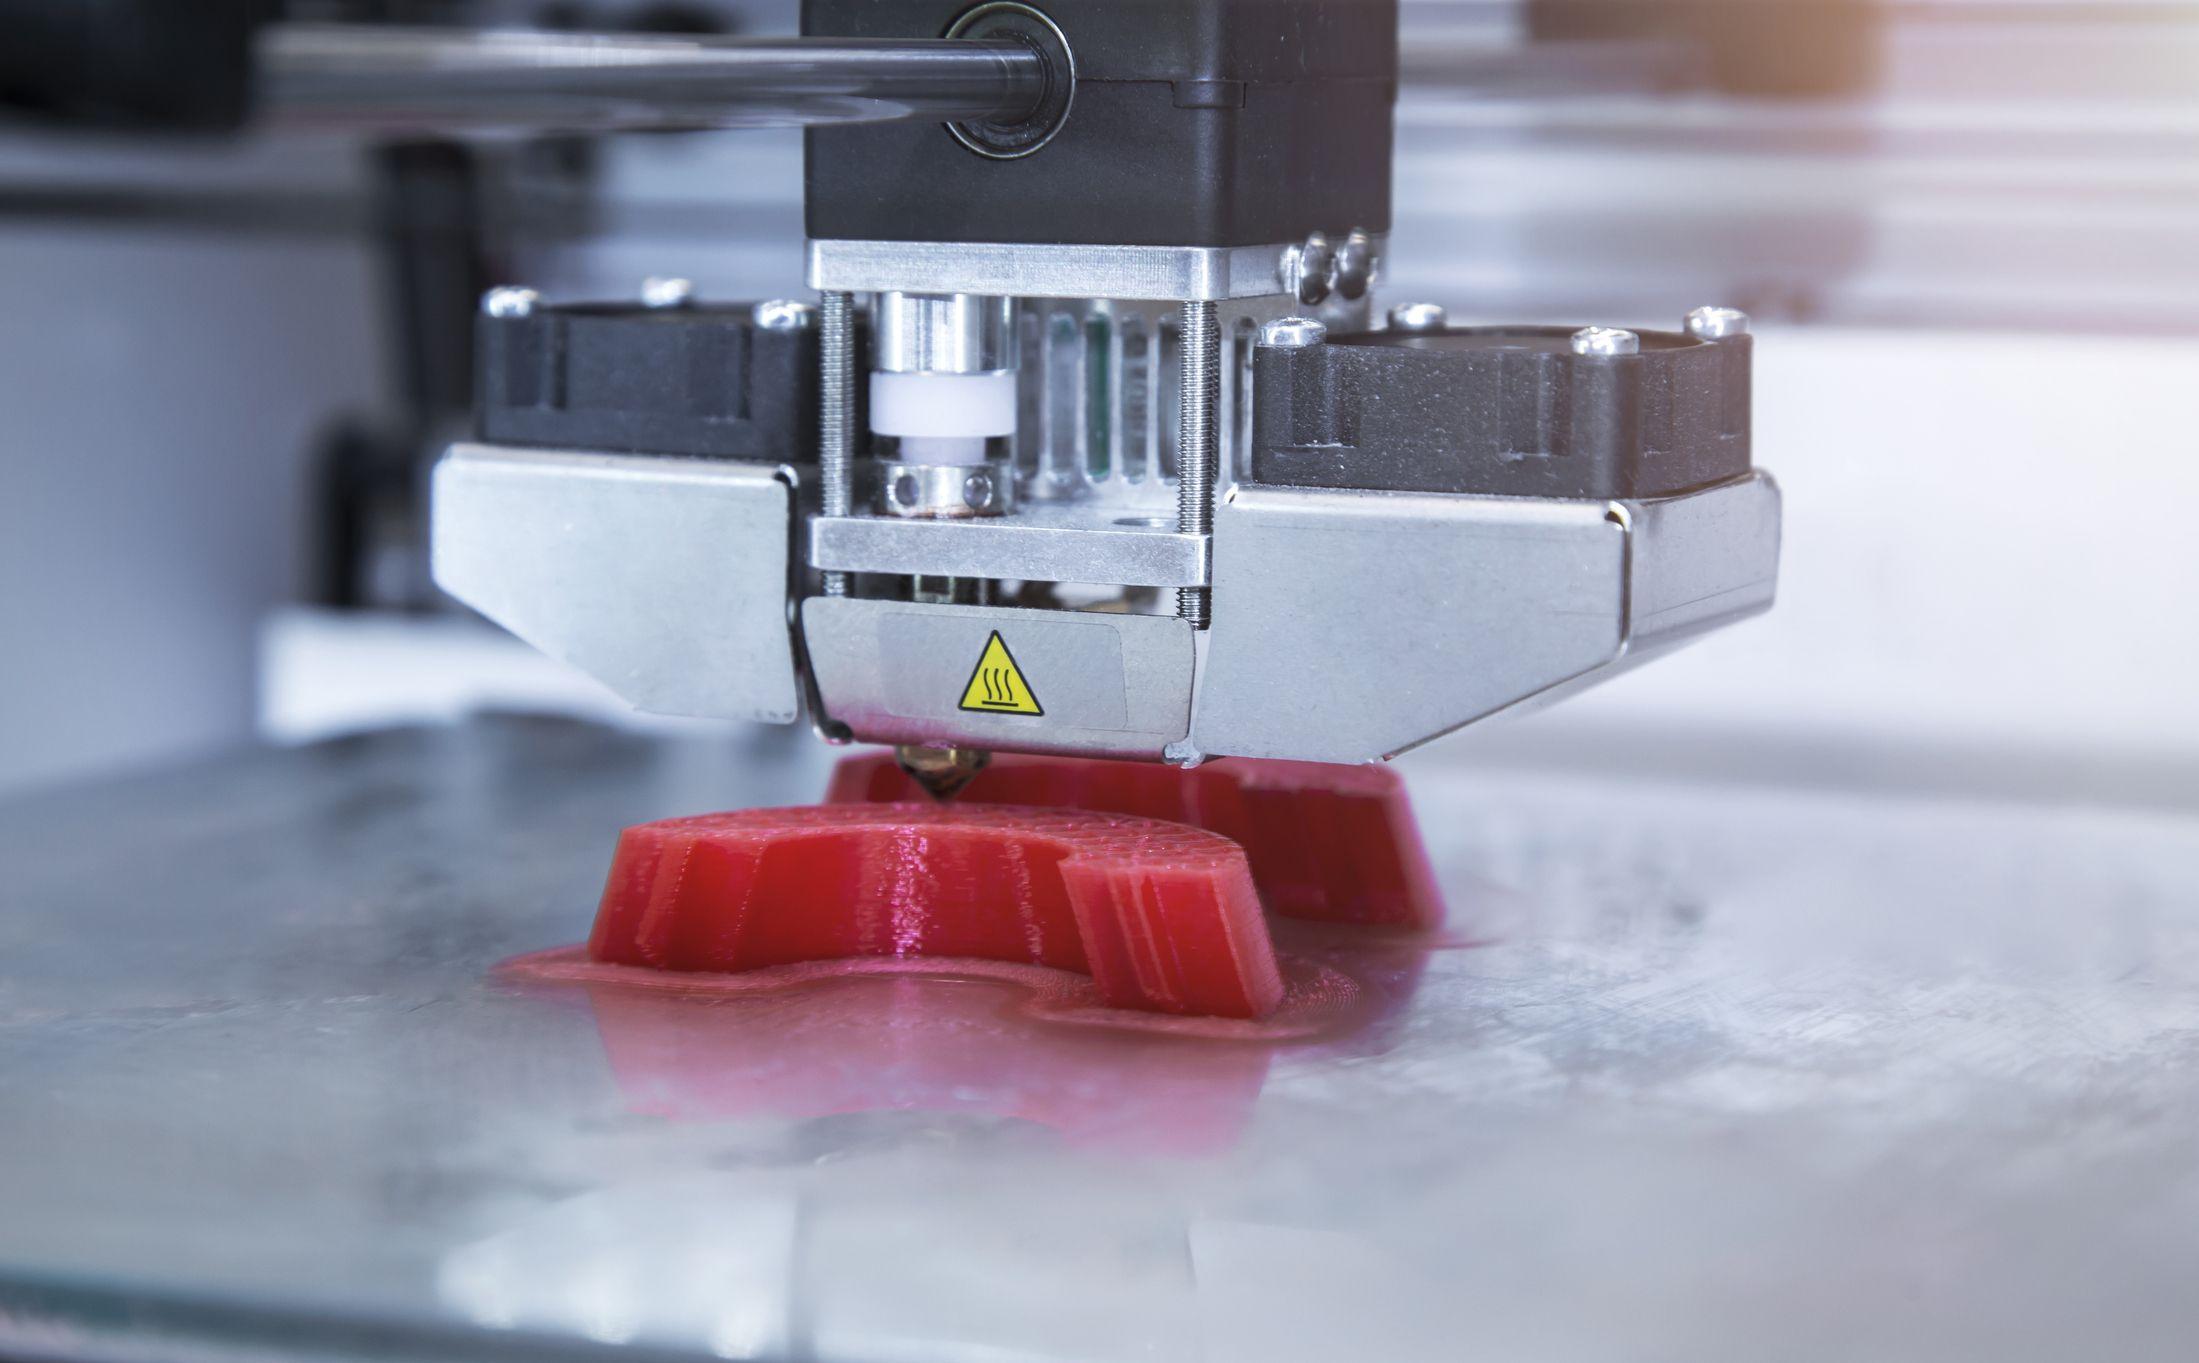 Creación de prototipos en 3D